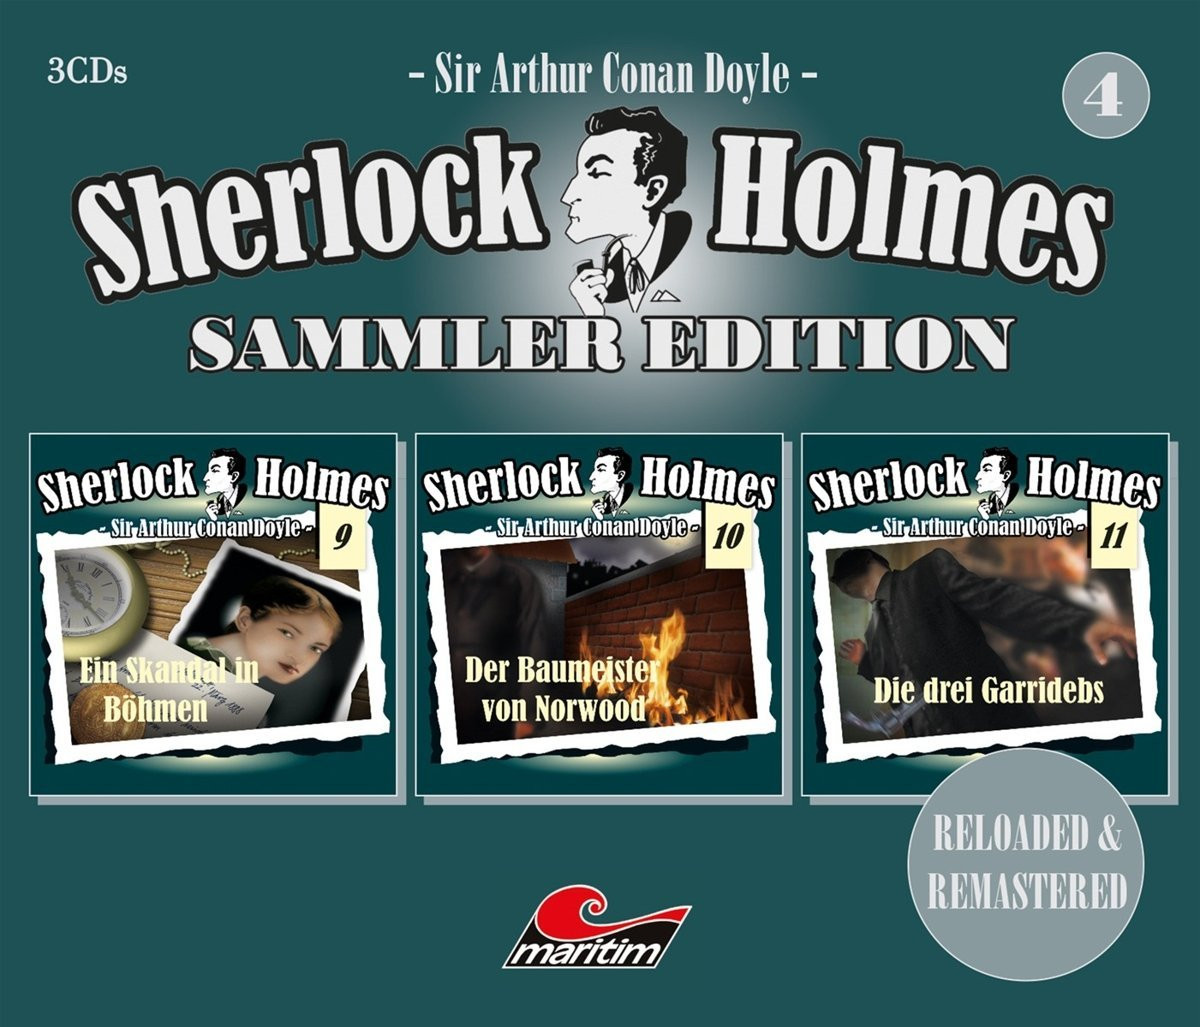 Sherlock Holmes - Sammler Edition - Box 4 (Folge 9, 10, 11)